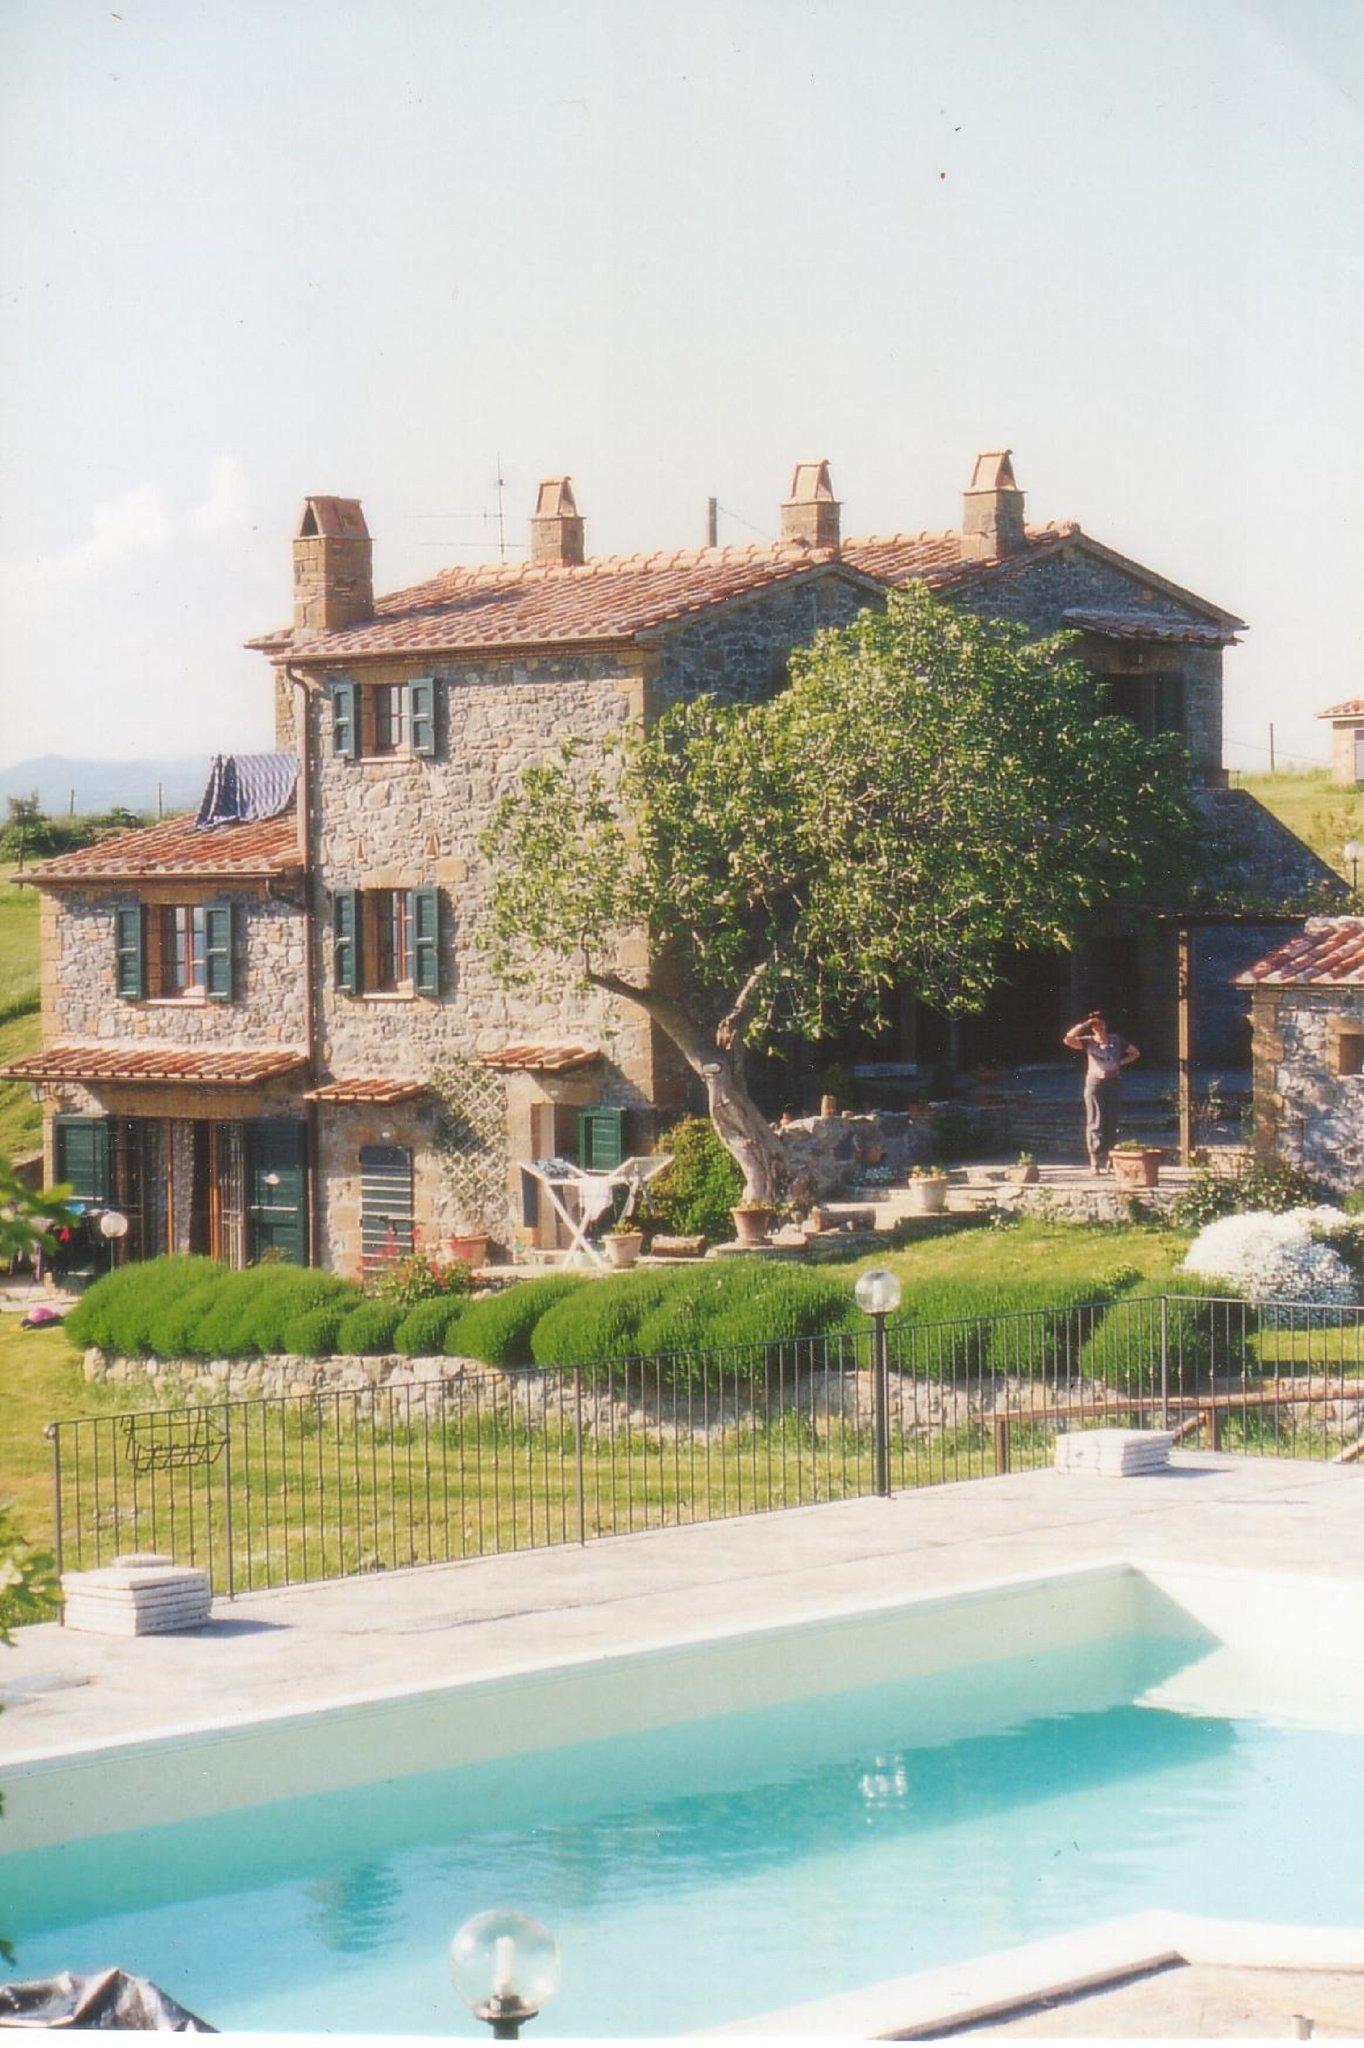 Casa Gialla unter der Weinpergola